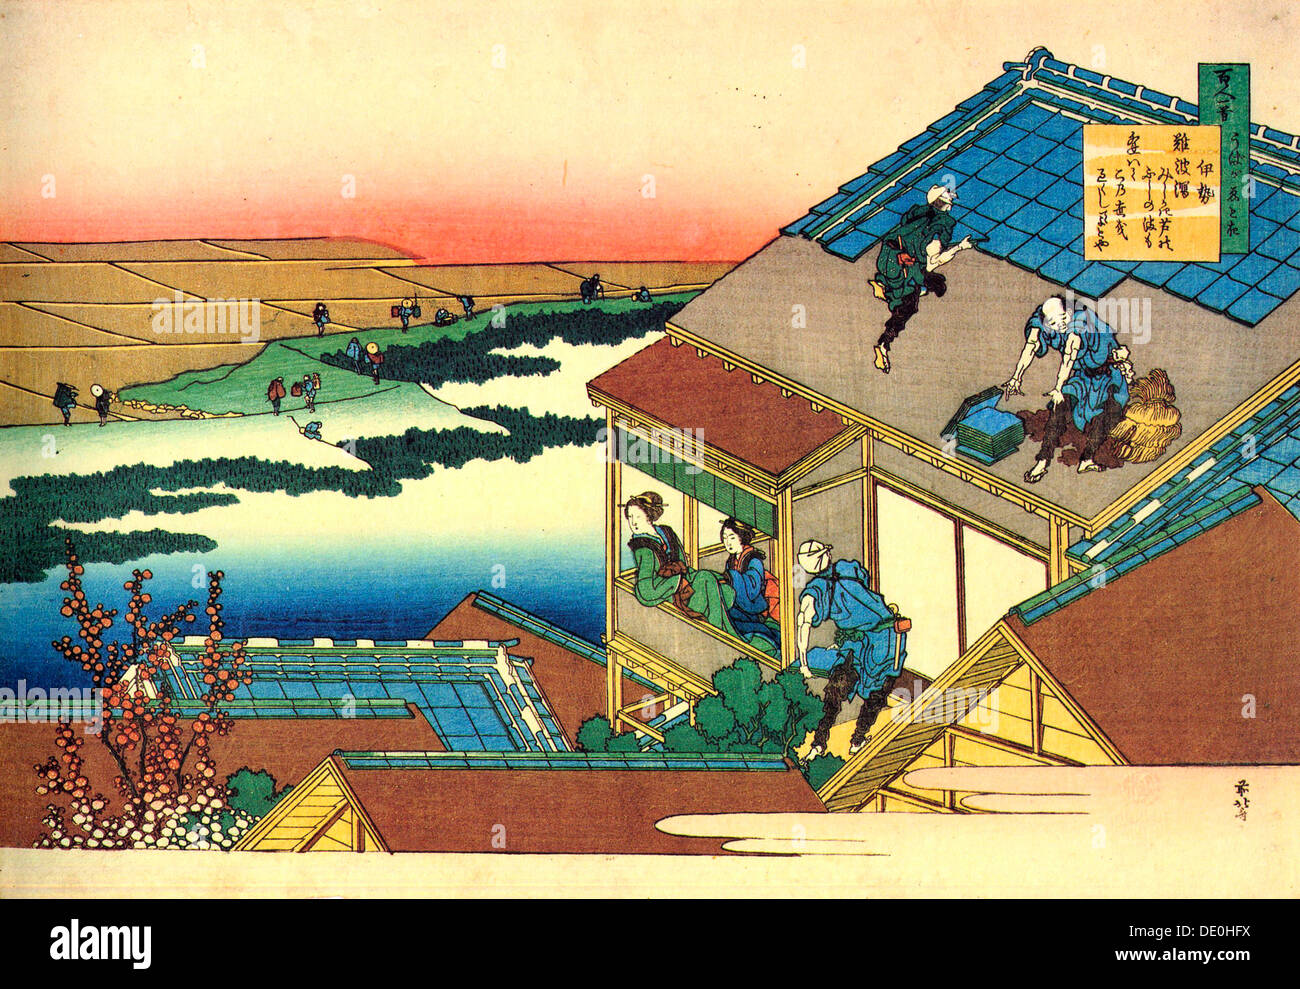 De la serie cien por cien poemas poetas: Lady Ise, c1830. Artista: Hokusai Imagen De Stock